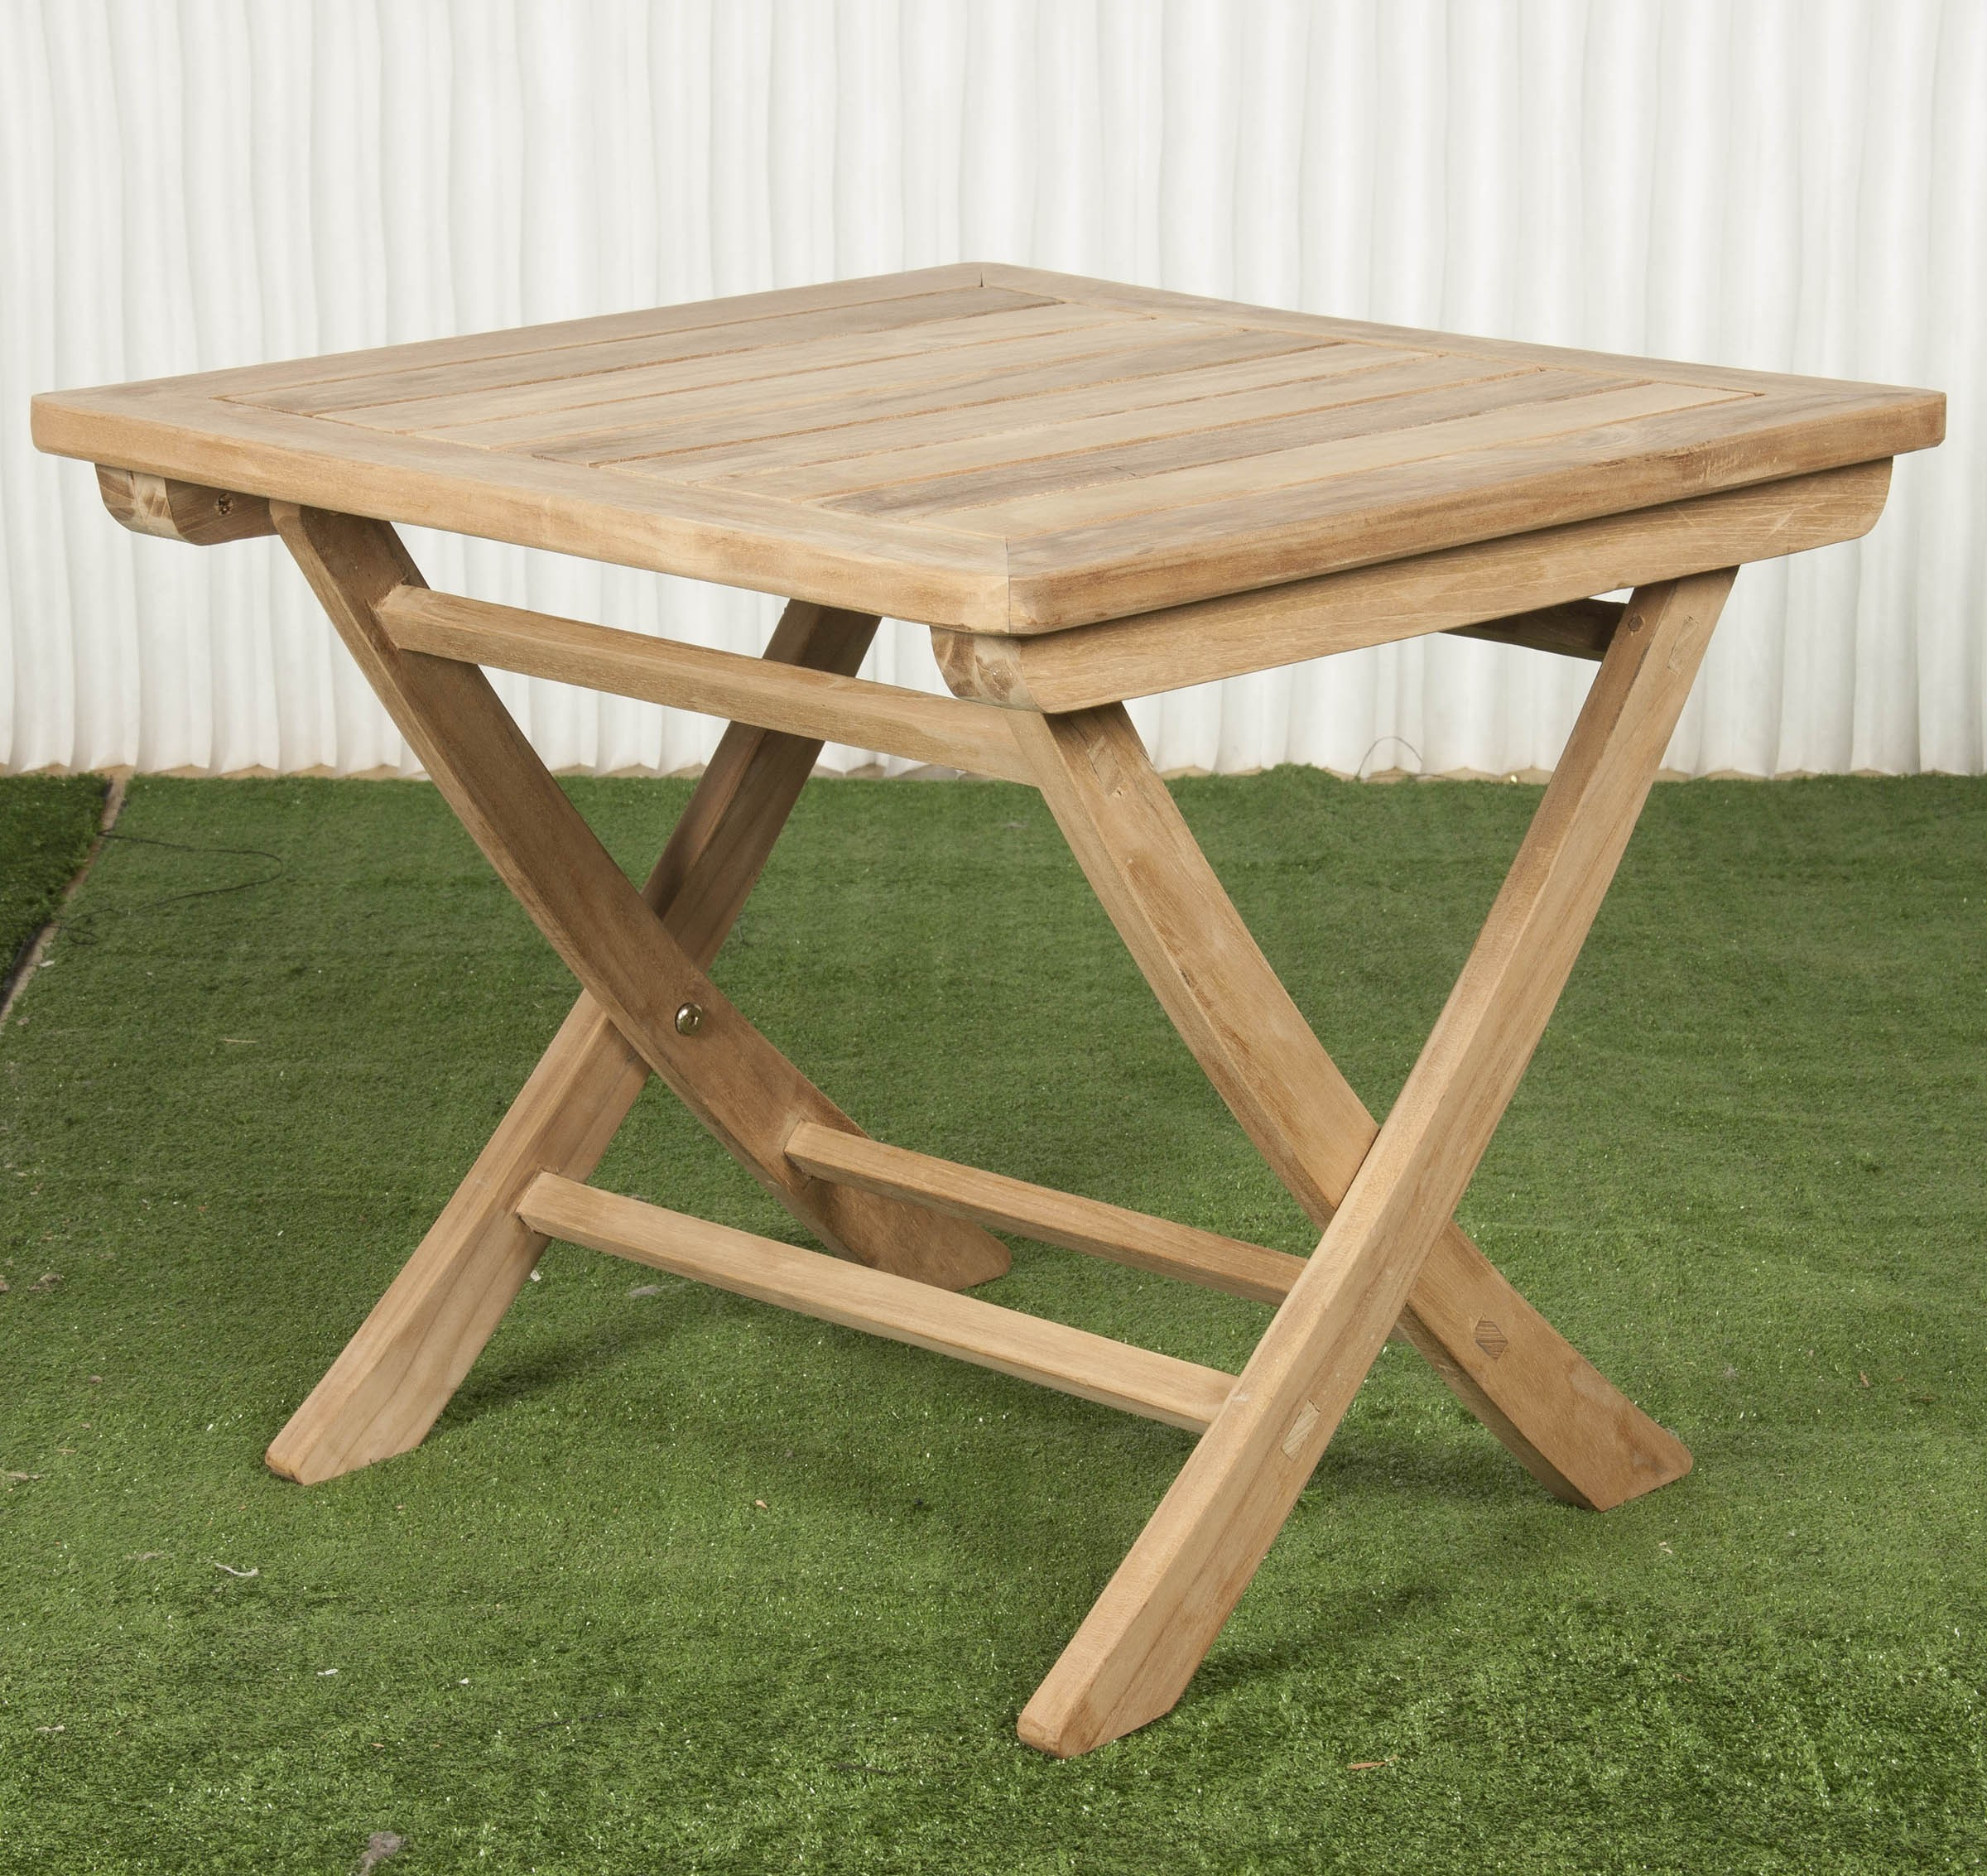 Mesas de madera plegables para exterior 49144 mesas ideas - Mesa de madera exterior ...